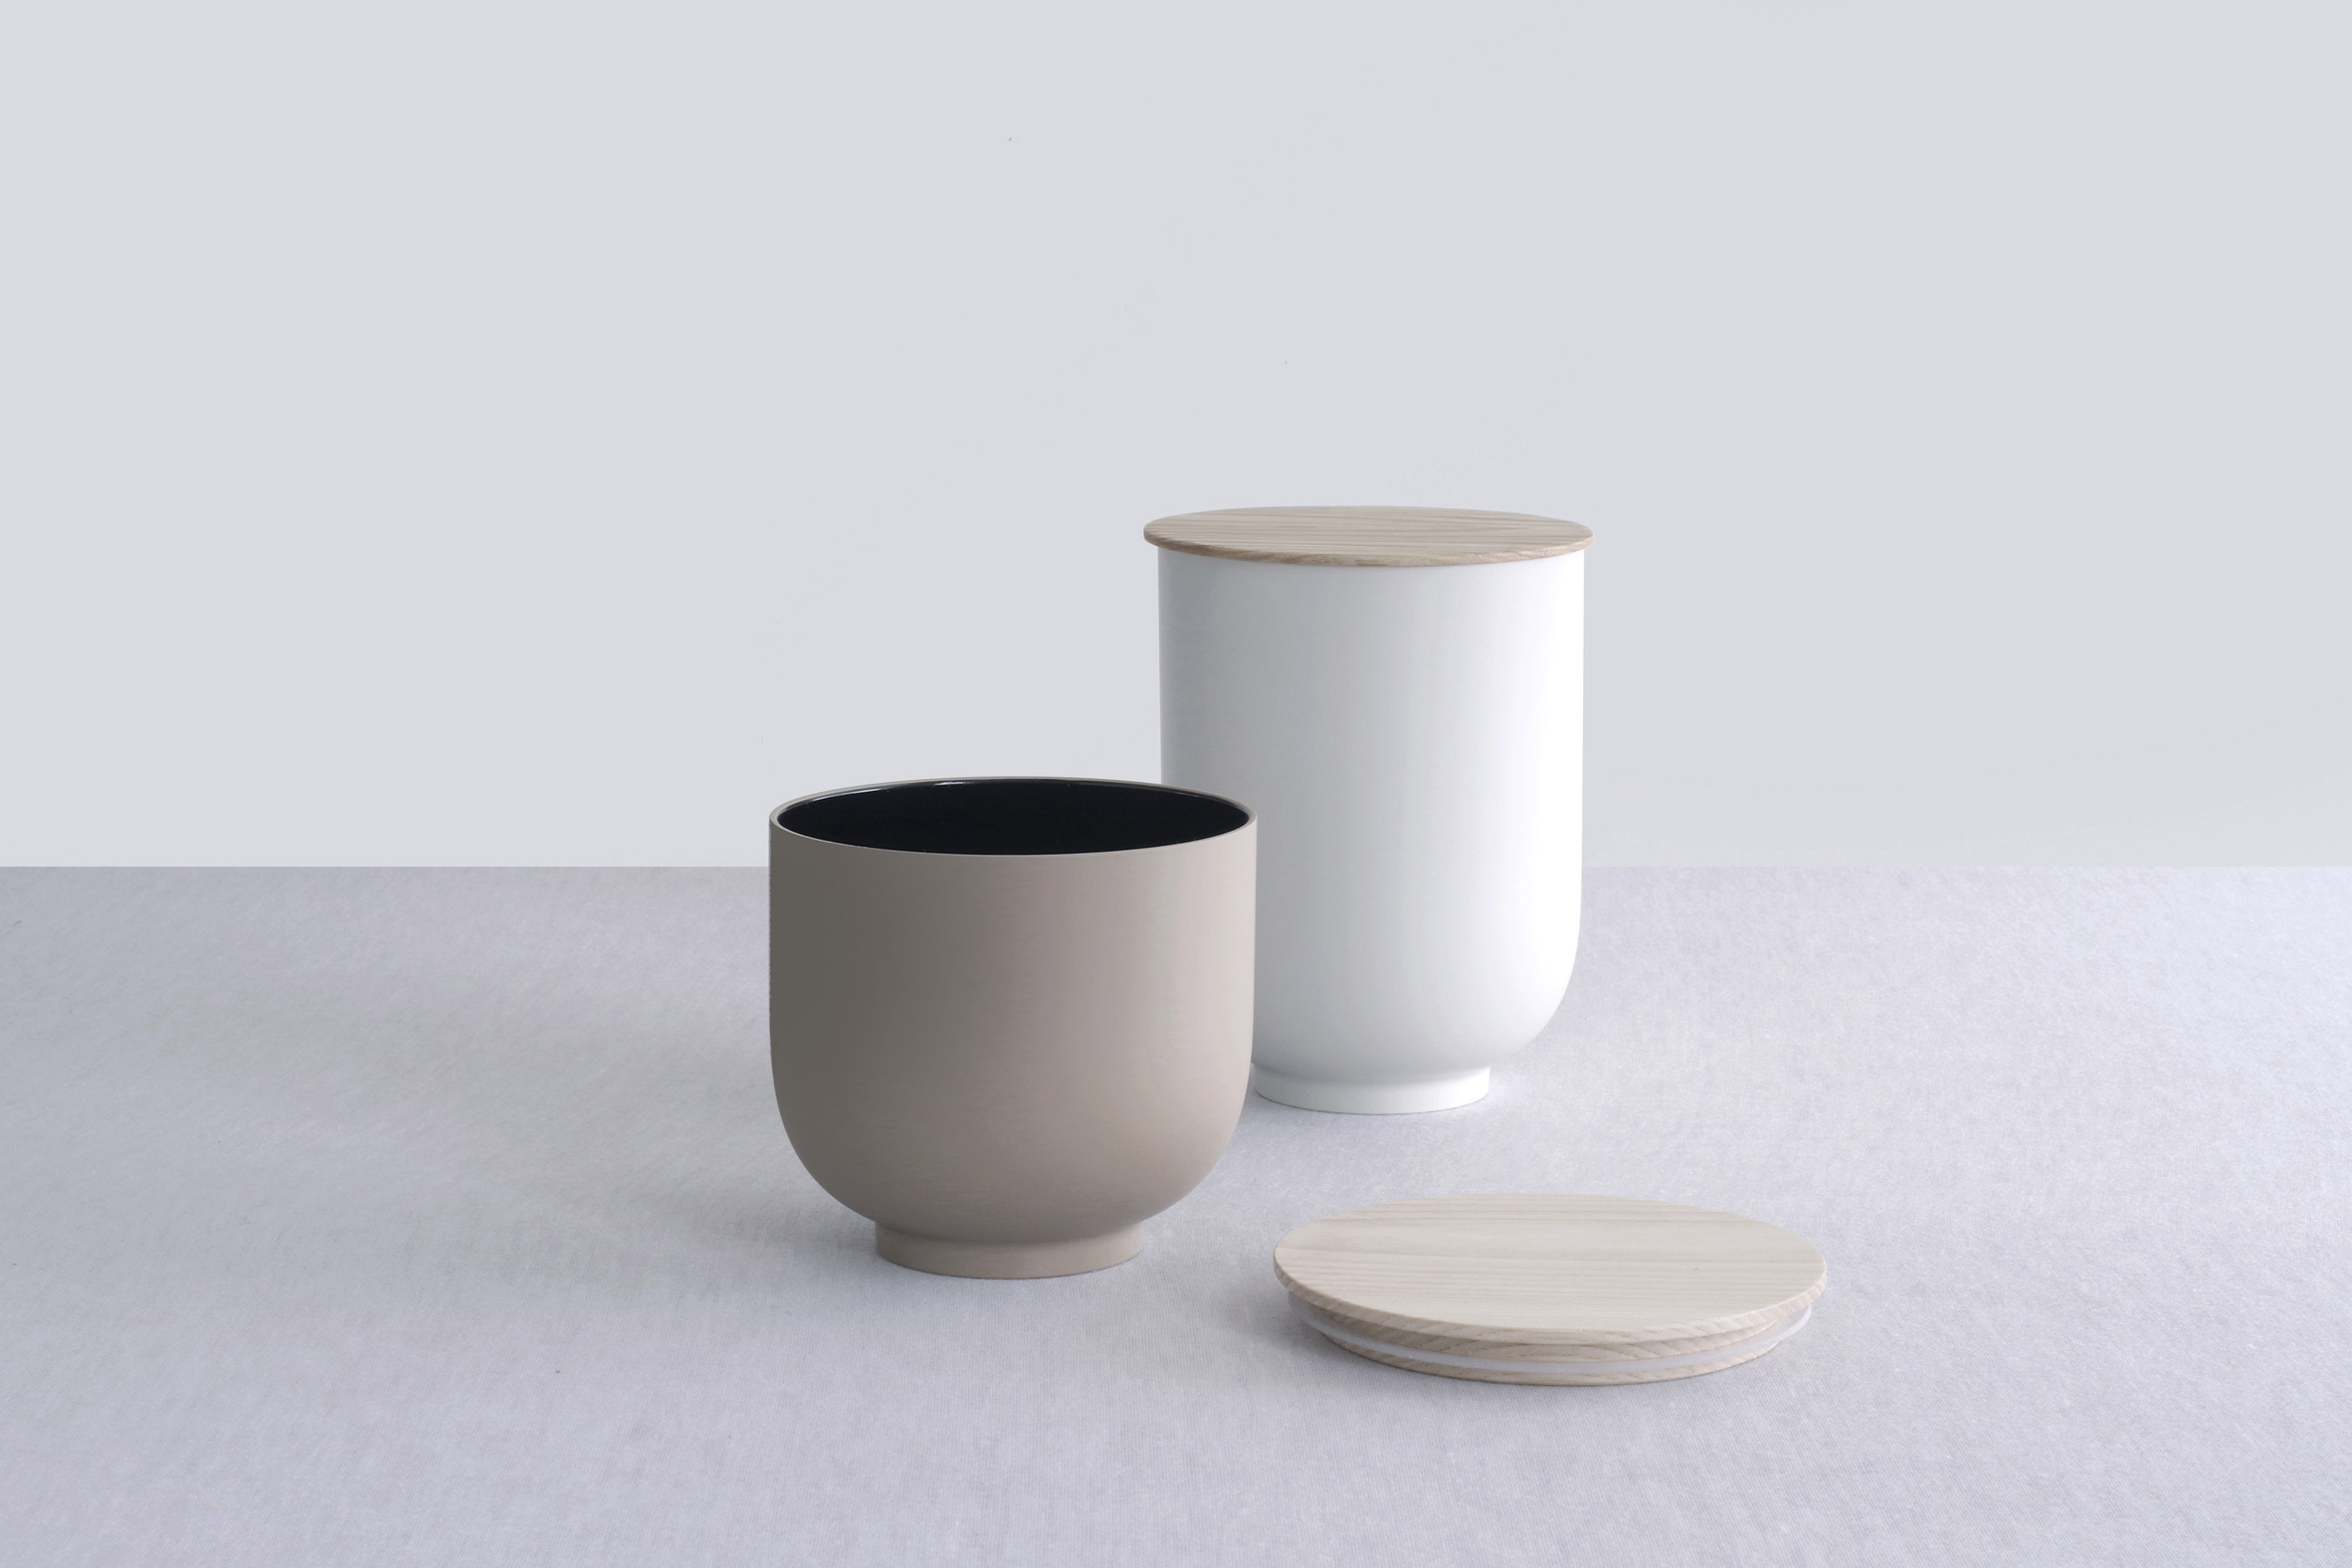 store-sekisaka-japan-creative-design-milan-homeware-_dezeen_2364_col_6.jpg